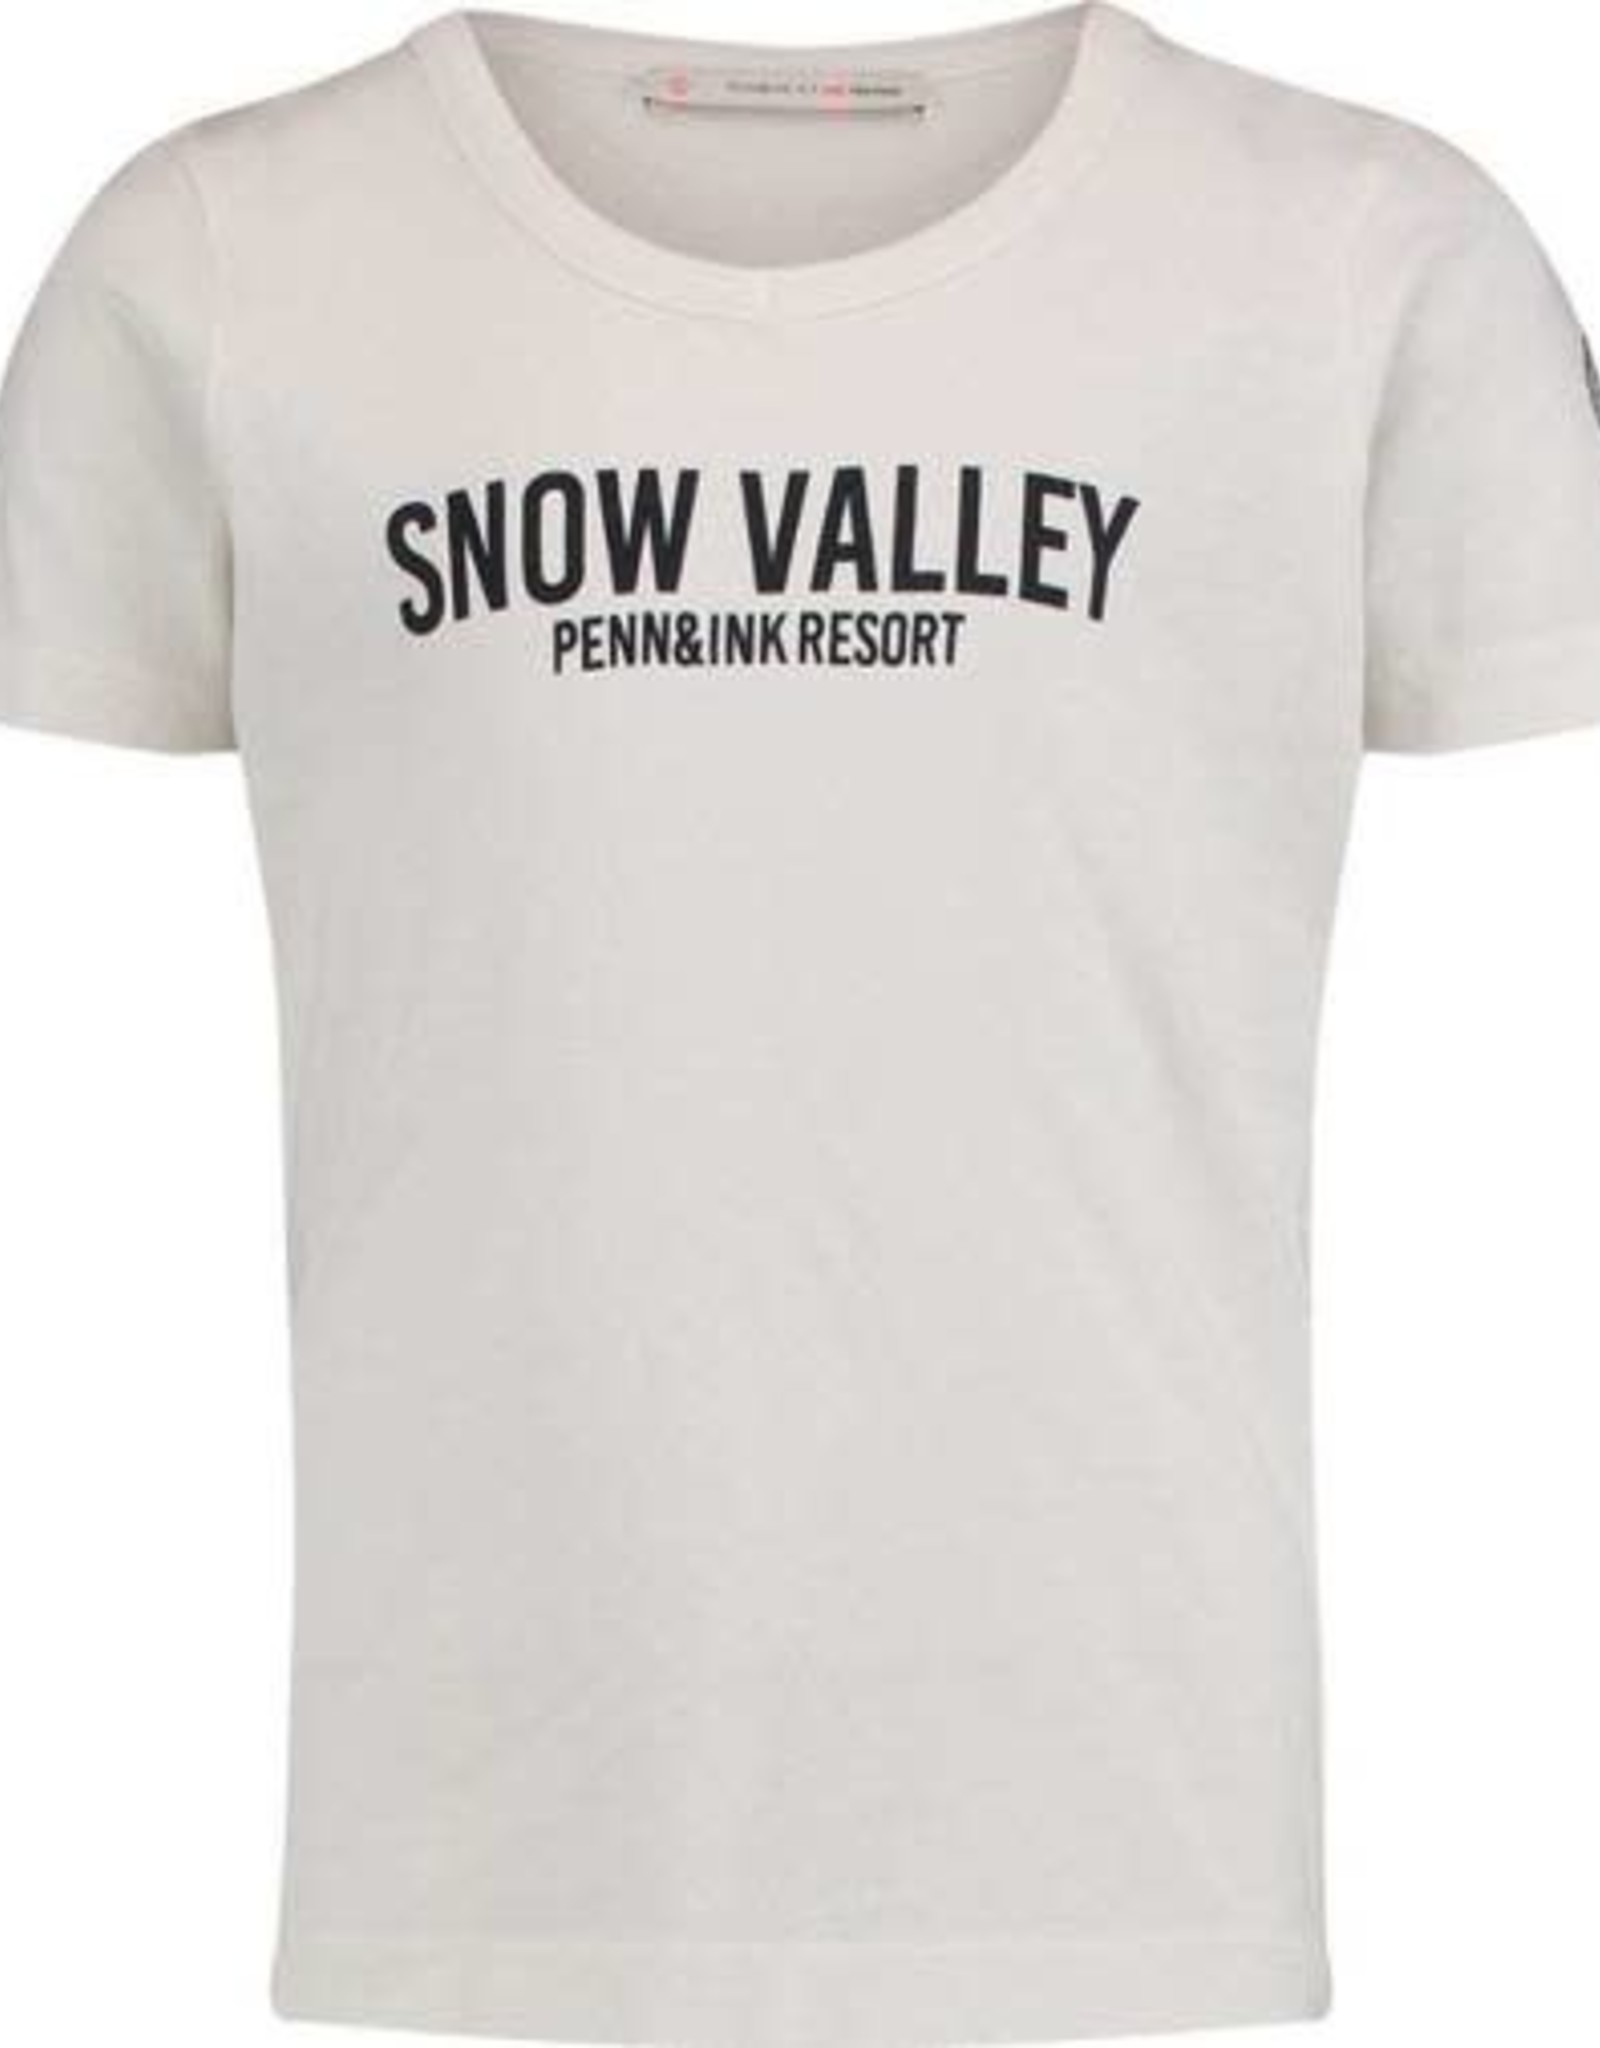 Penn & Ink N.Y. T-Shirt Snow Valley White/Navy mt 8